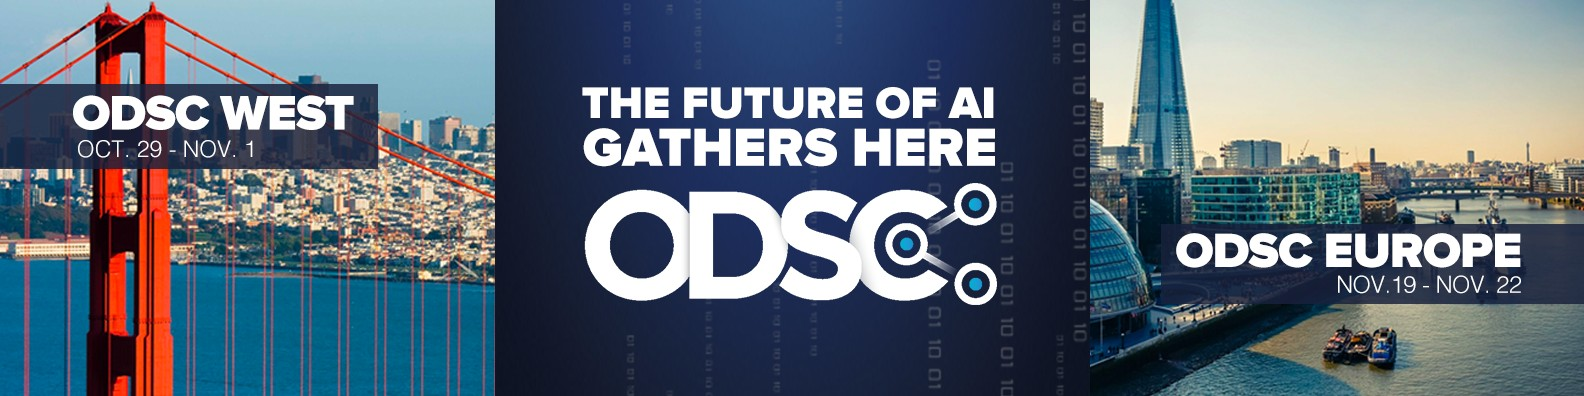 Open Data Science Conference (ODSC)   LinkedIn